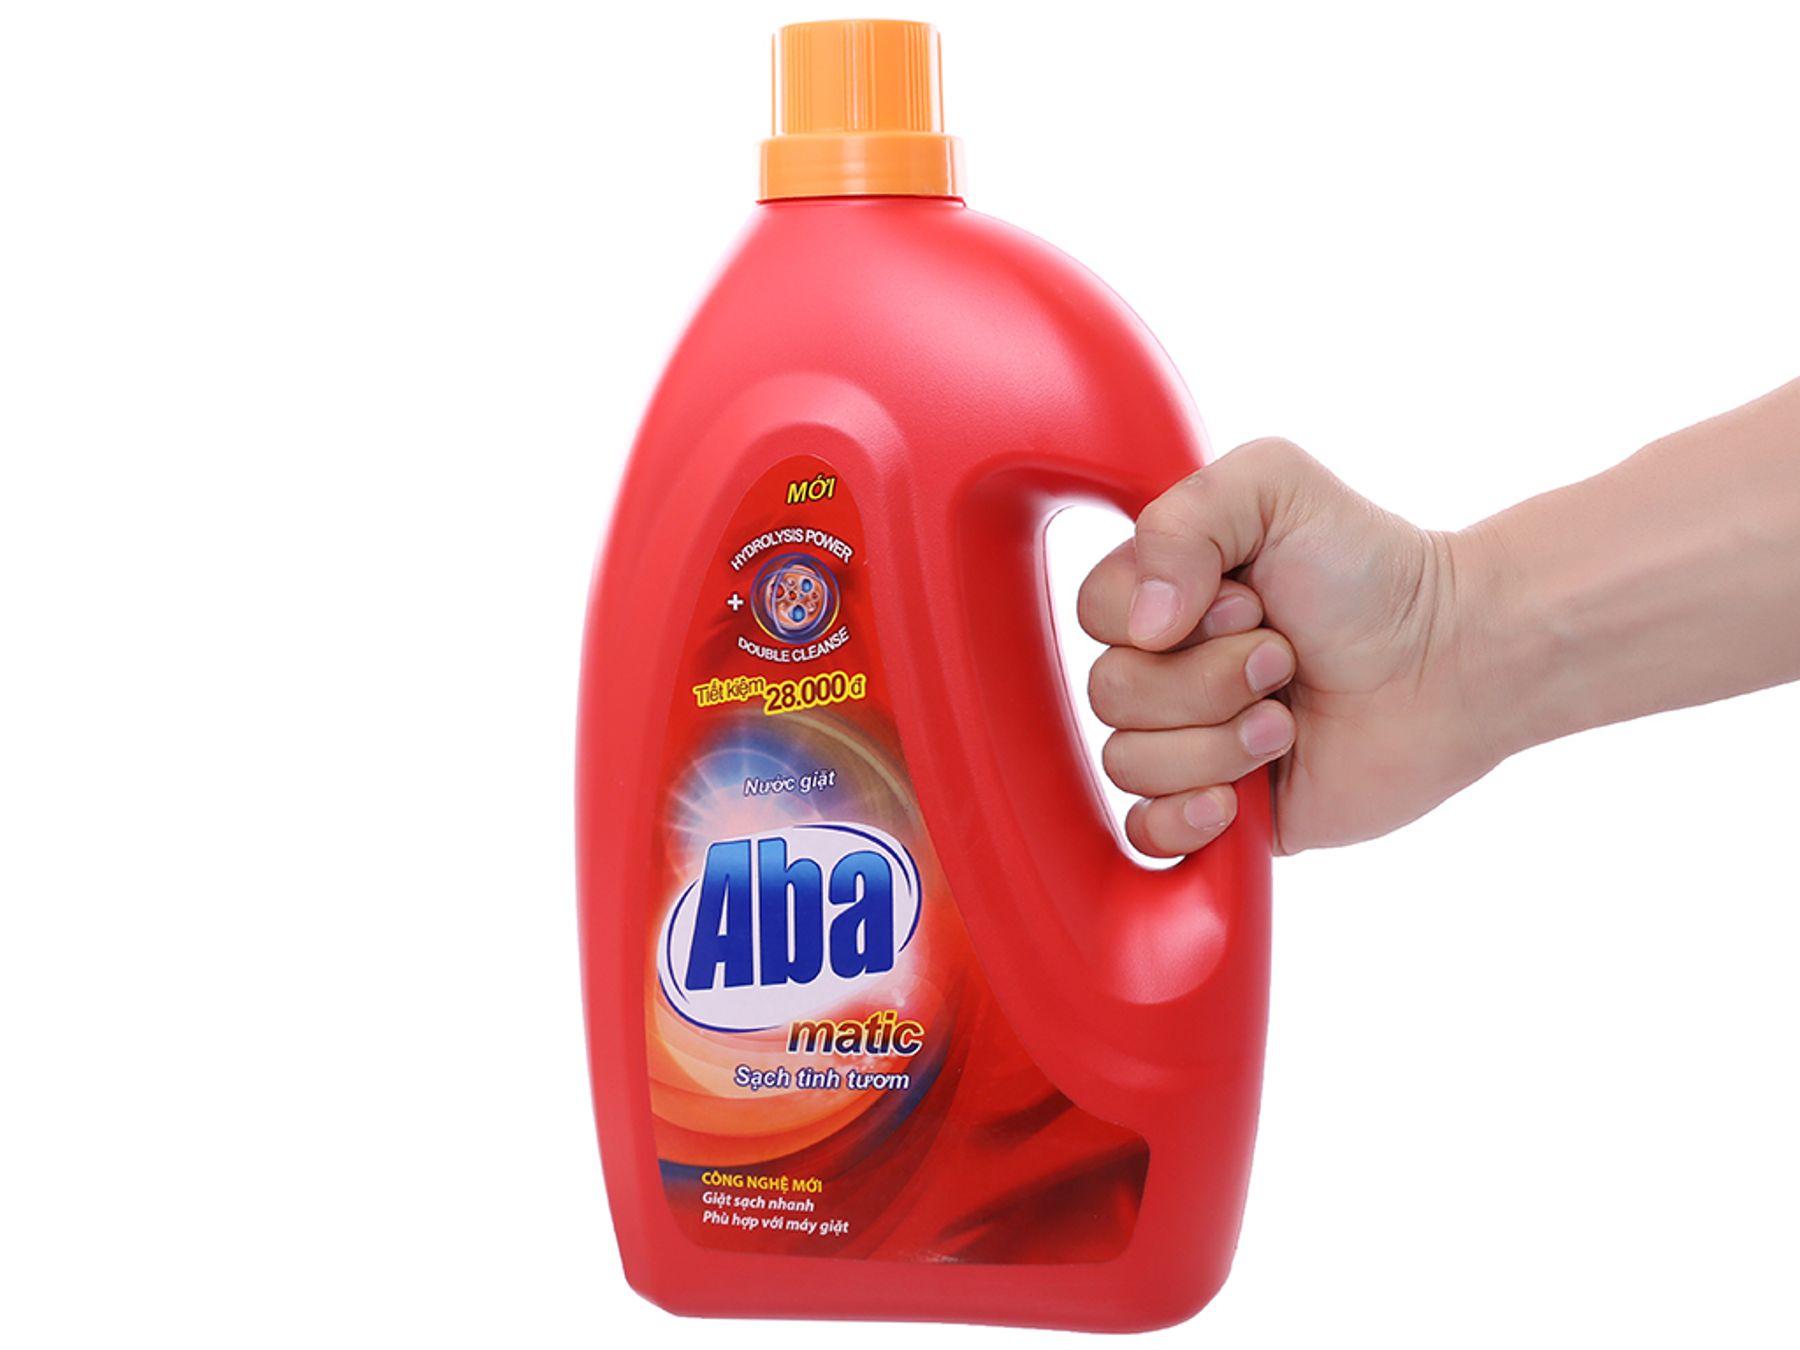 Nước giặt Aba